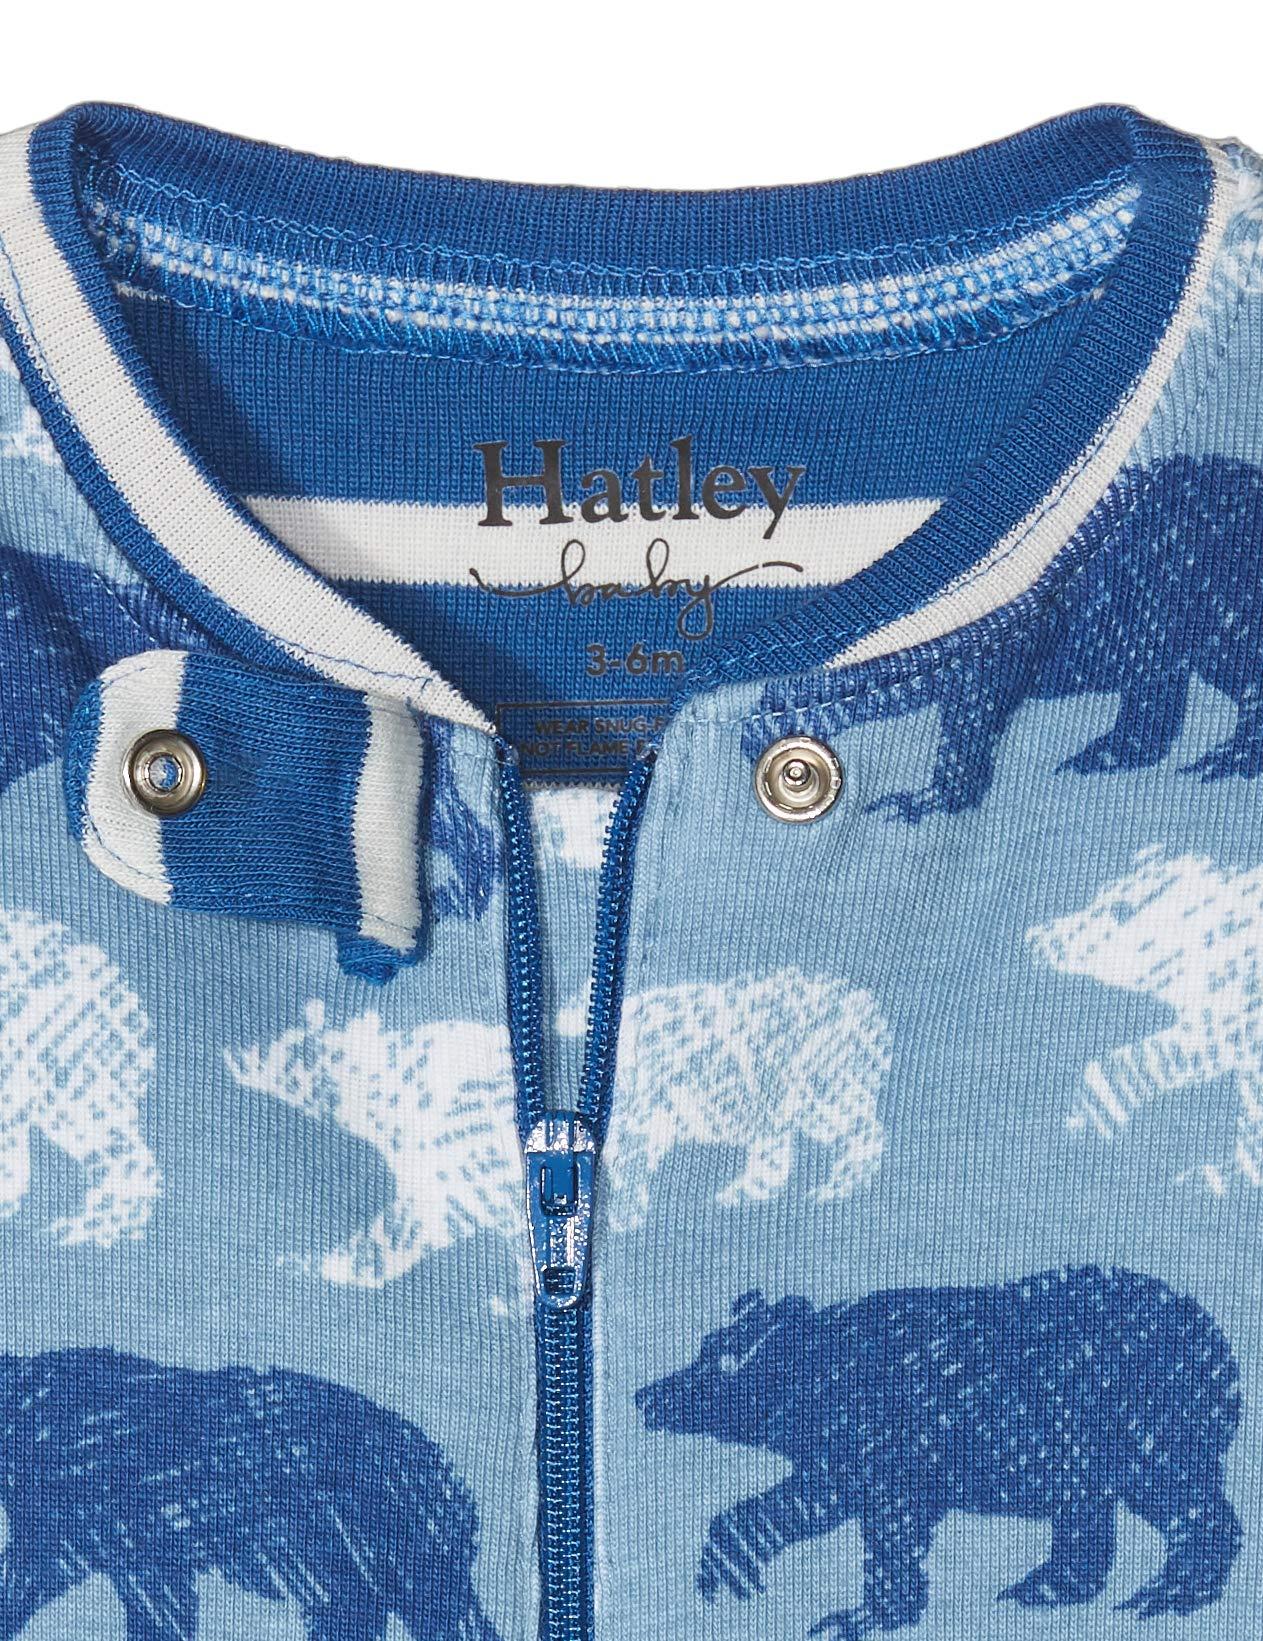 Hatley Organic Cotton Sleepsuit Pelele para Dormir para Bebés 5